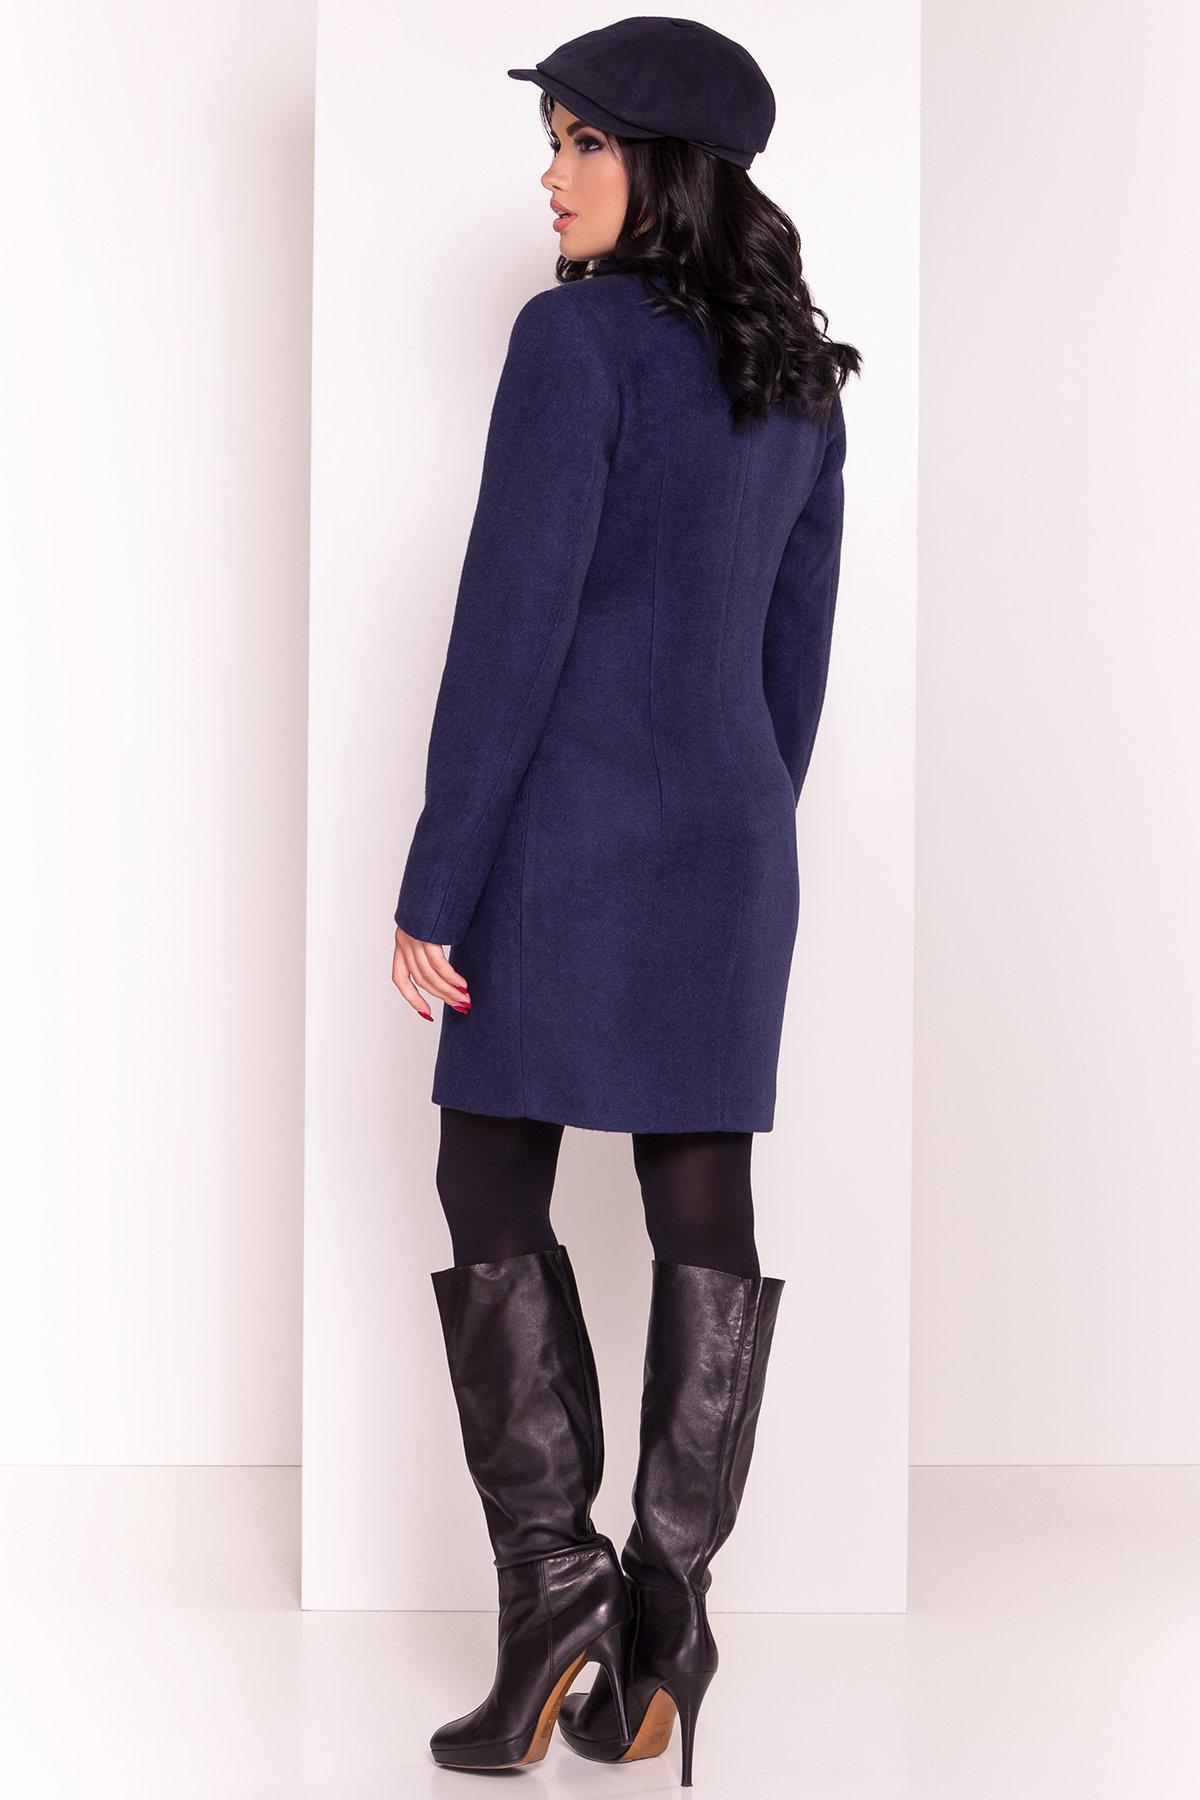 Пальто Камила 5373 АРТ. 36549 Цвет: Темно-синий 17 - фото 6, интернет магазин tm-modus.ru